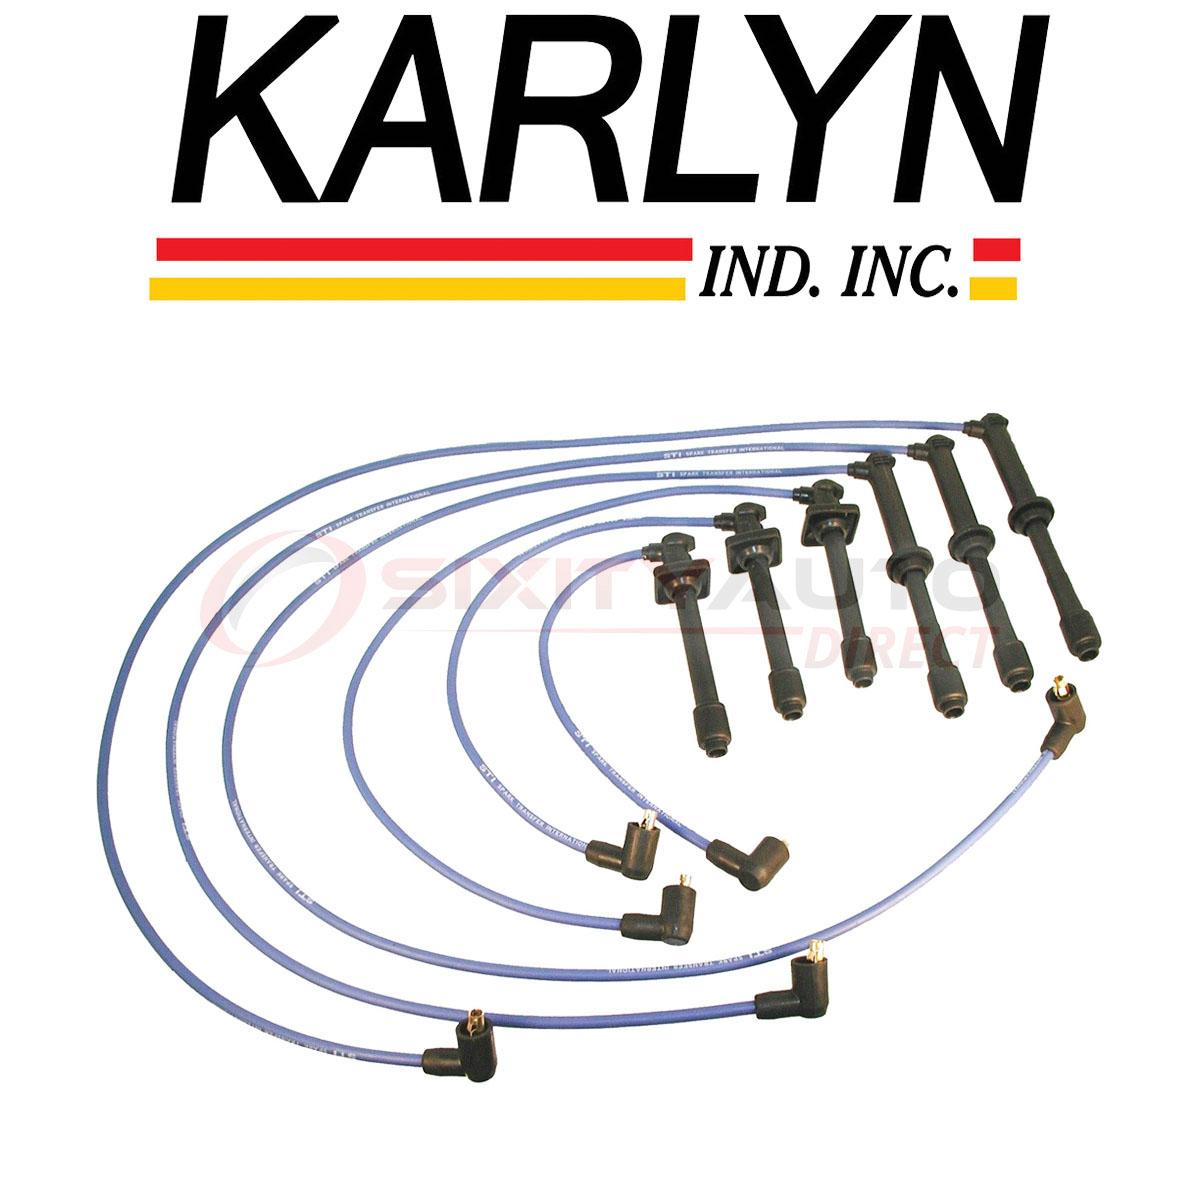 Karlyn STI STI Spark Plug Wire Set for 1996-1997 Mazda 626 ...